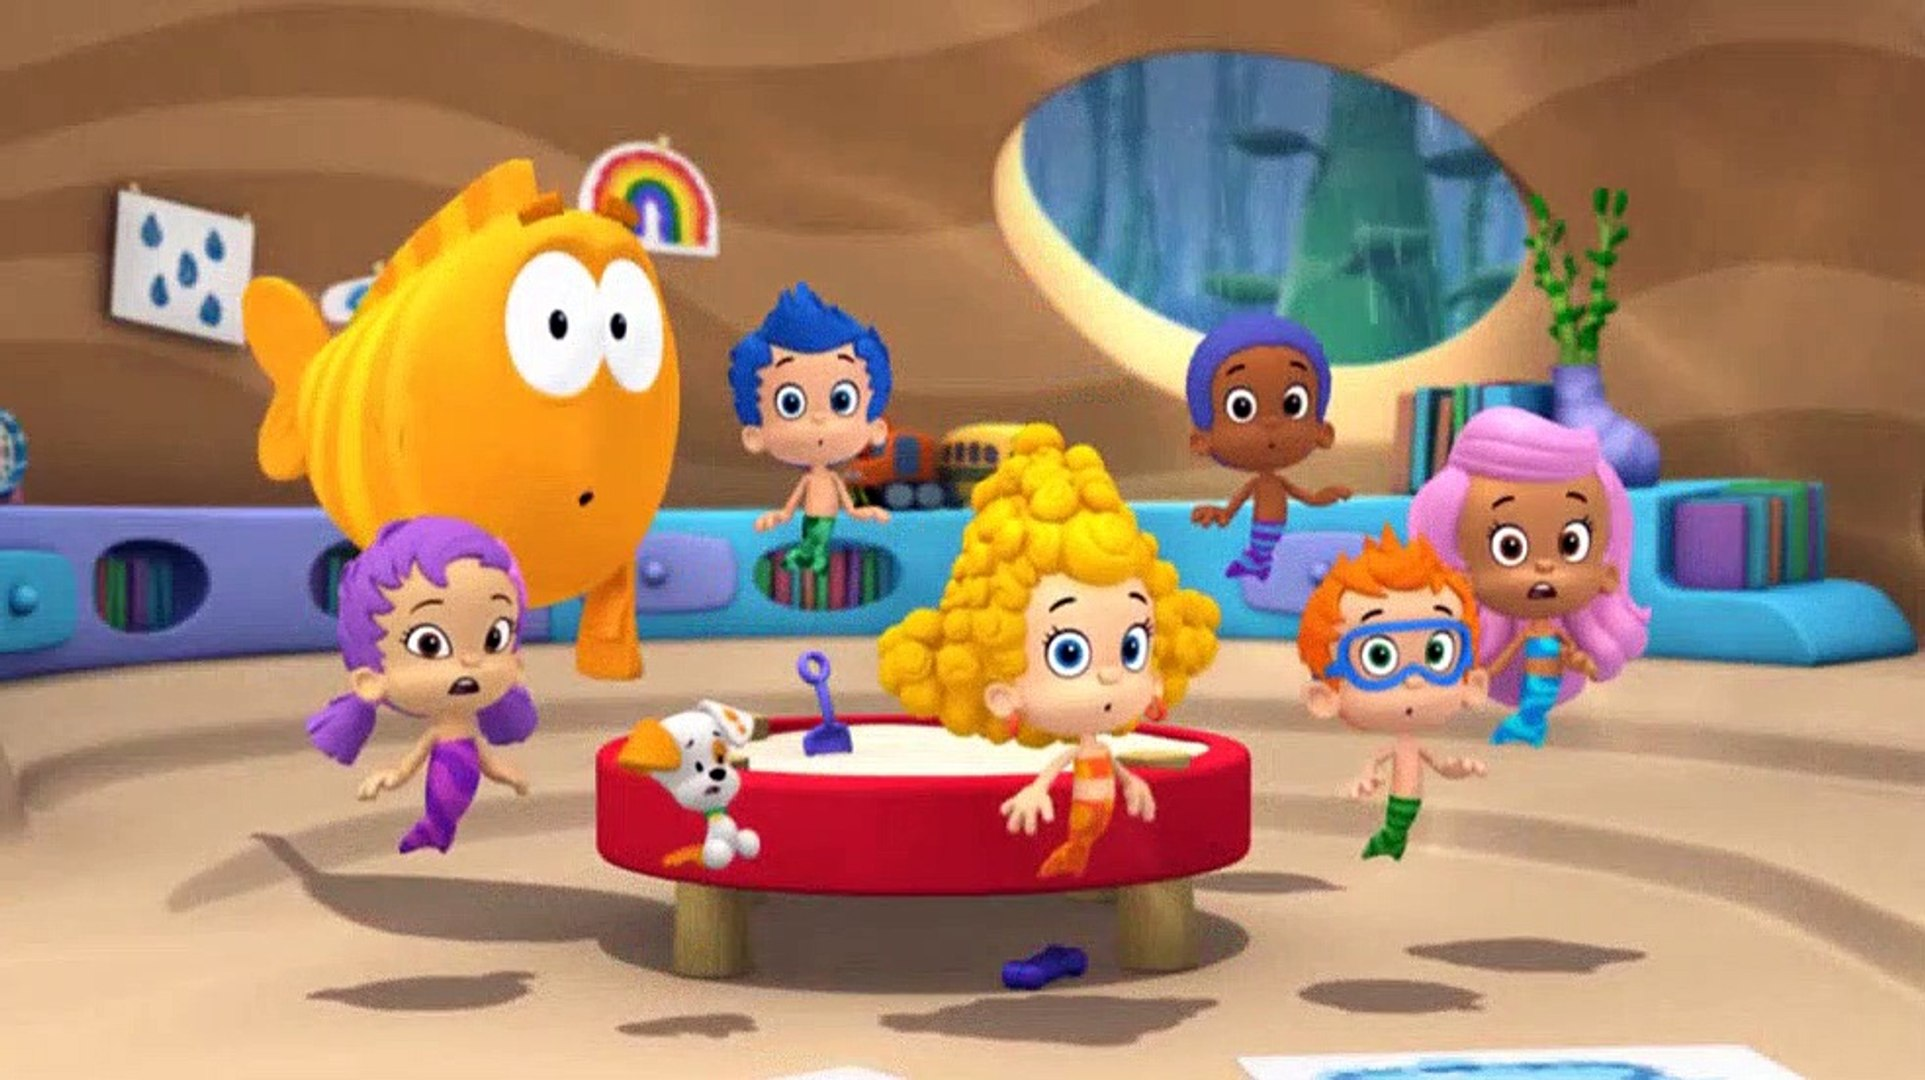 Bubble Guppies S03e20 Puddleball